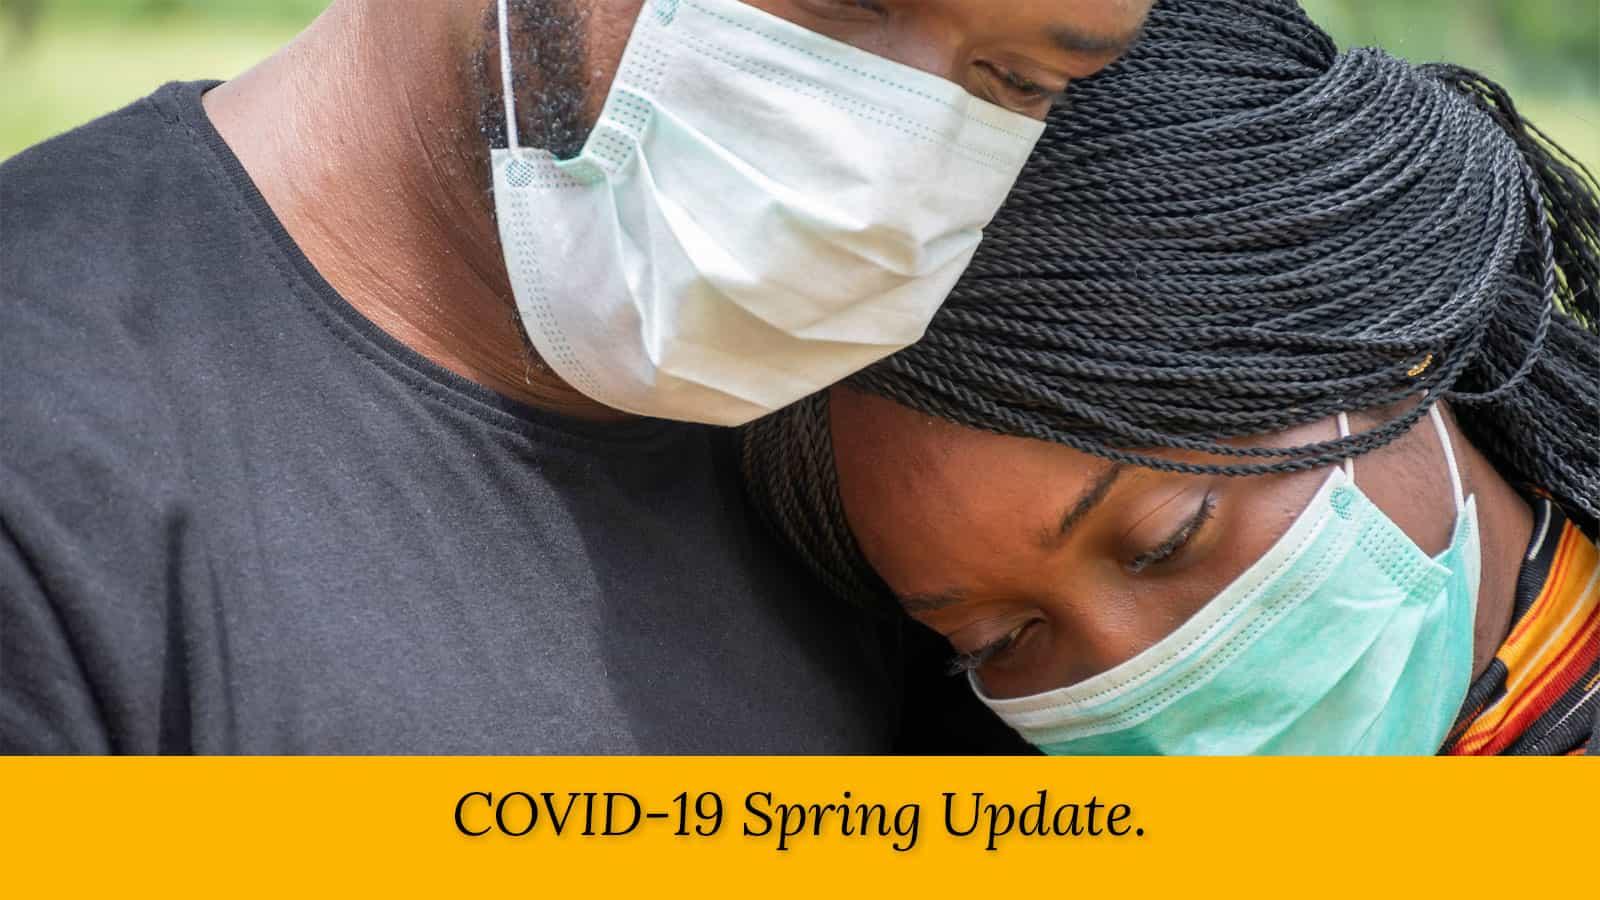 wmp-carousel-covid-19-spring-update